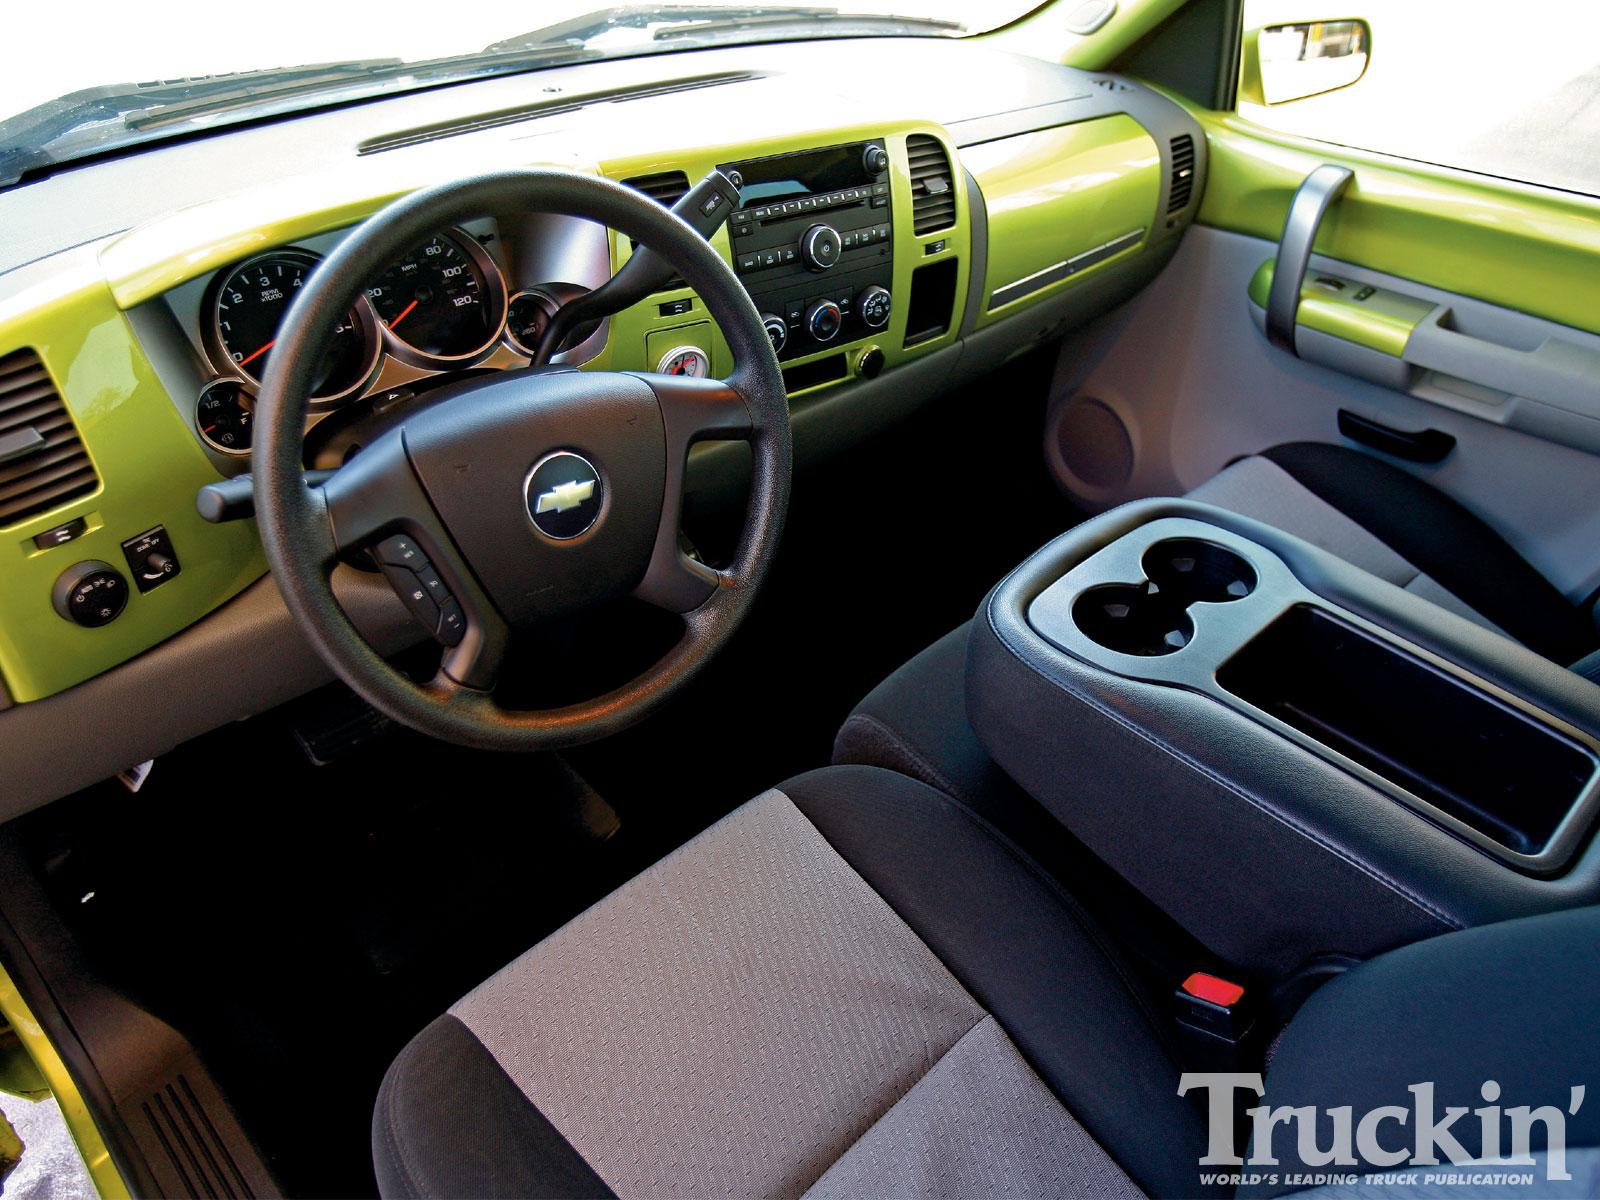 2008 Chevy Silverado 24 Inch Rims Truckin Magazine